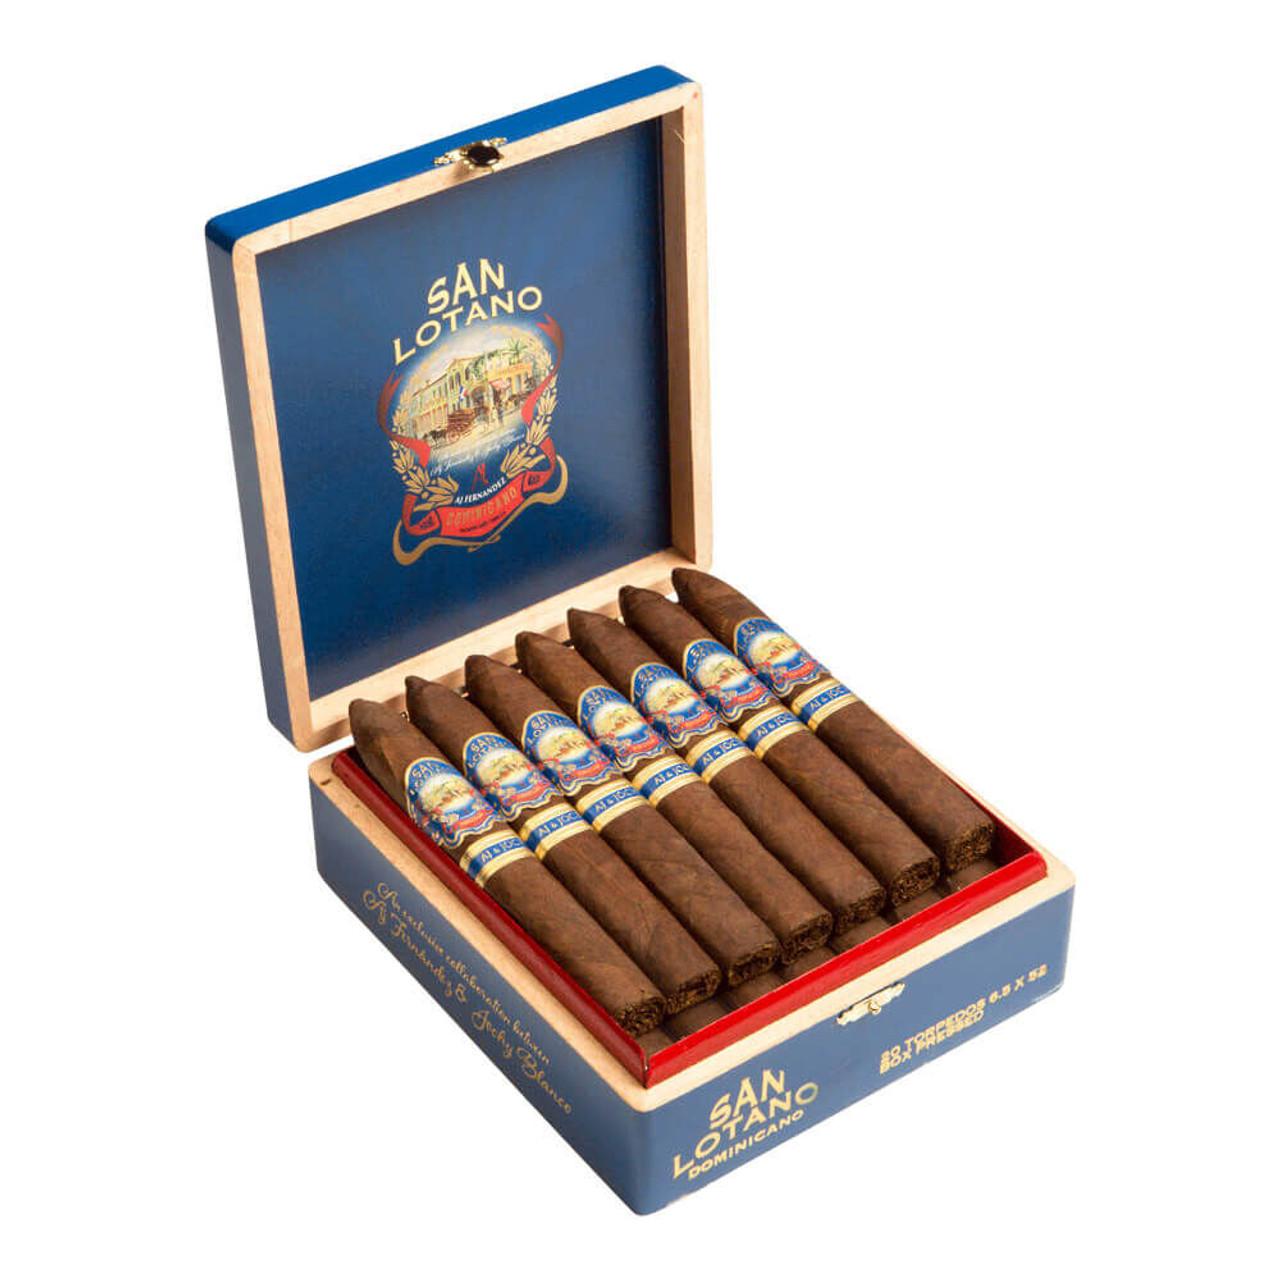 AJ Fernandez San Lotano Dominicano Torpedo Box Pressed Cigars - 6.5 x 52 (Box of 20)